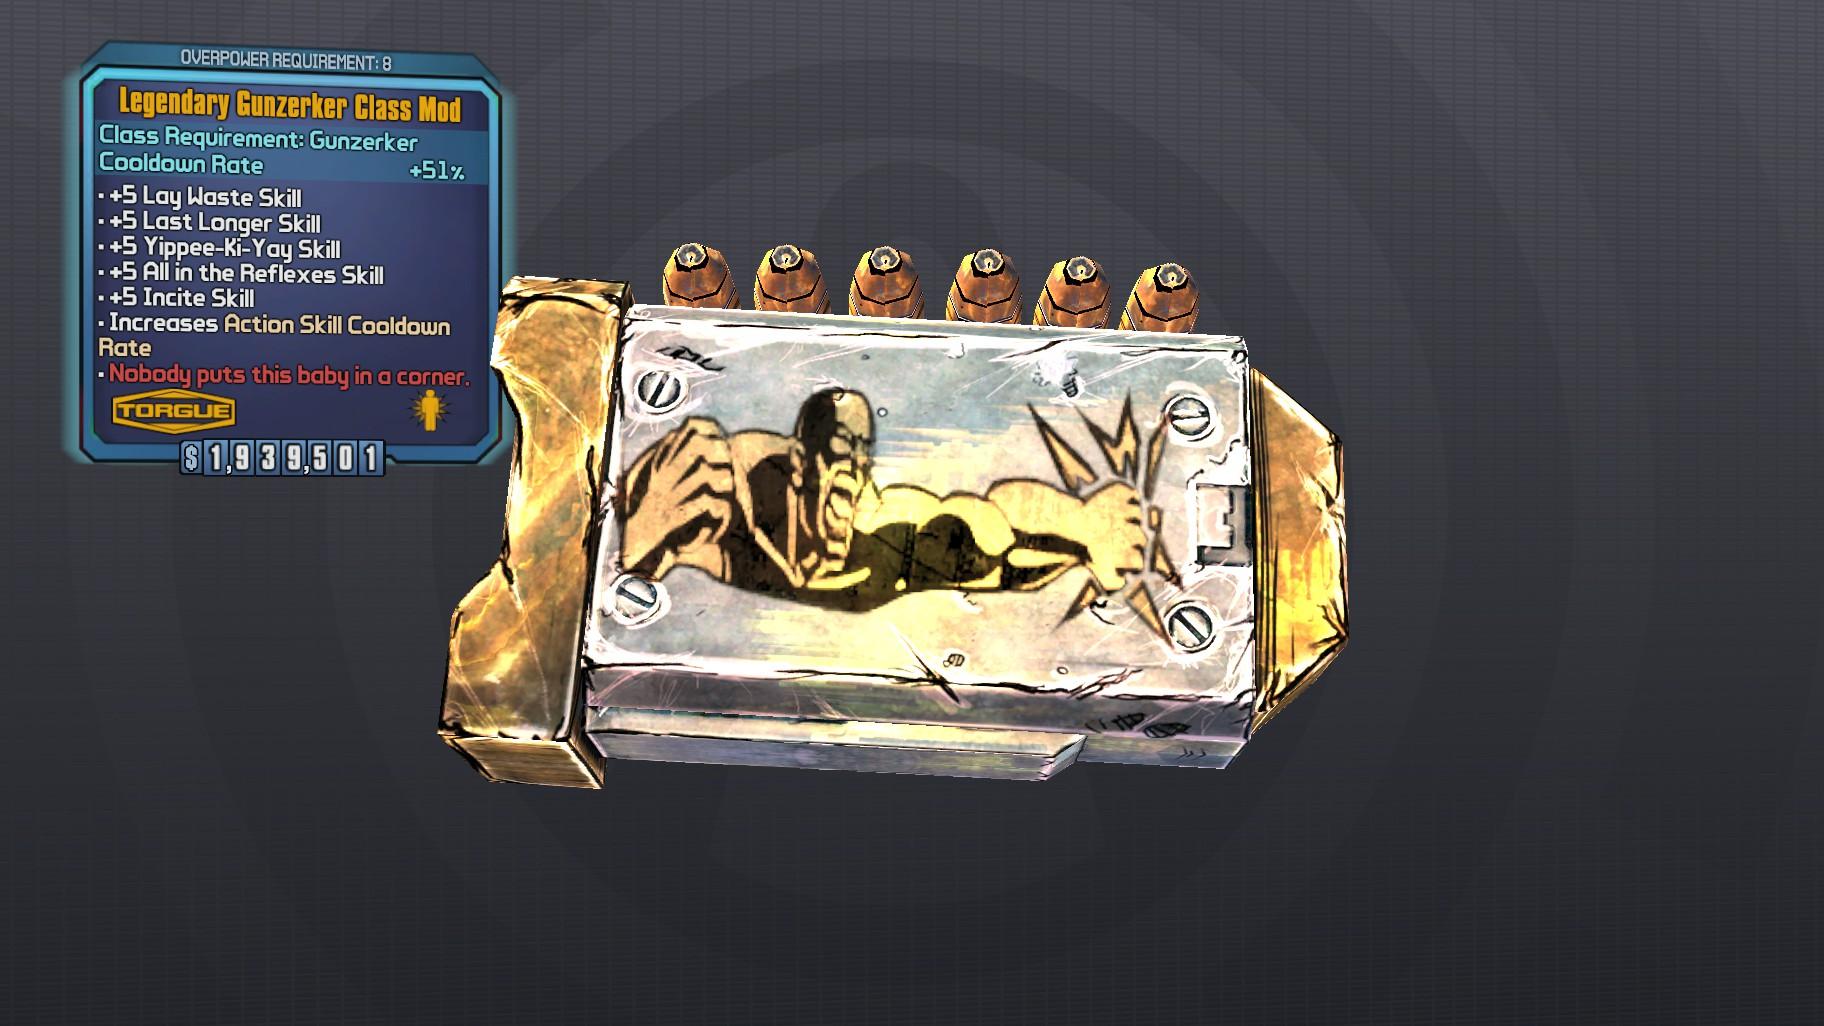 Legendary Gunzerker